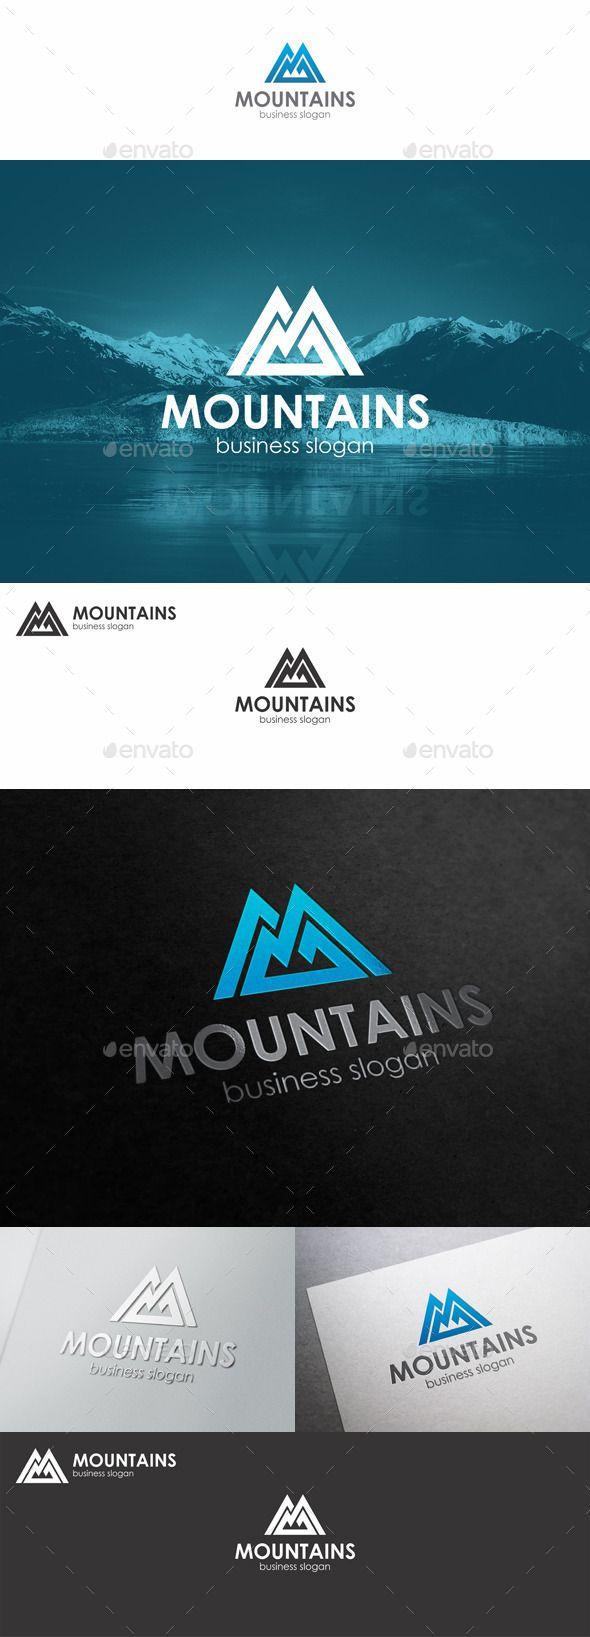 Mountains Logo Monogram M Letter — Vector EPS #ski station #mountains logo • Available here → https://graphicriver.net/item/mountains-logo-monogram-m-letter/10311209?ref=pxcr